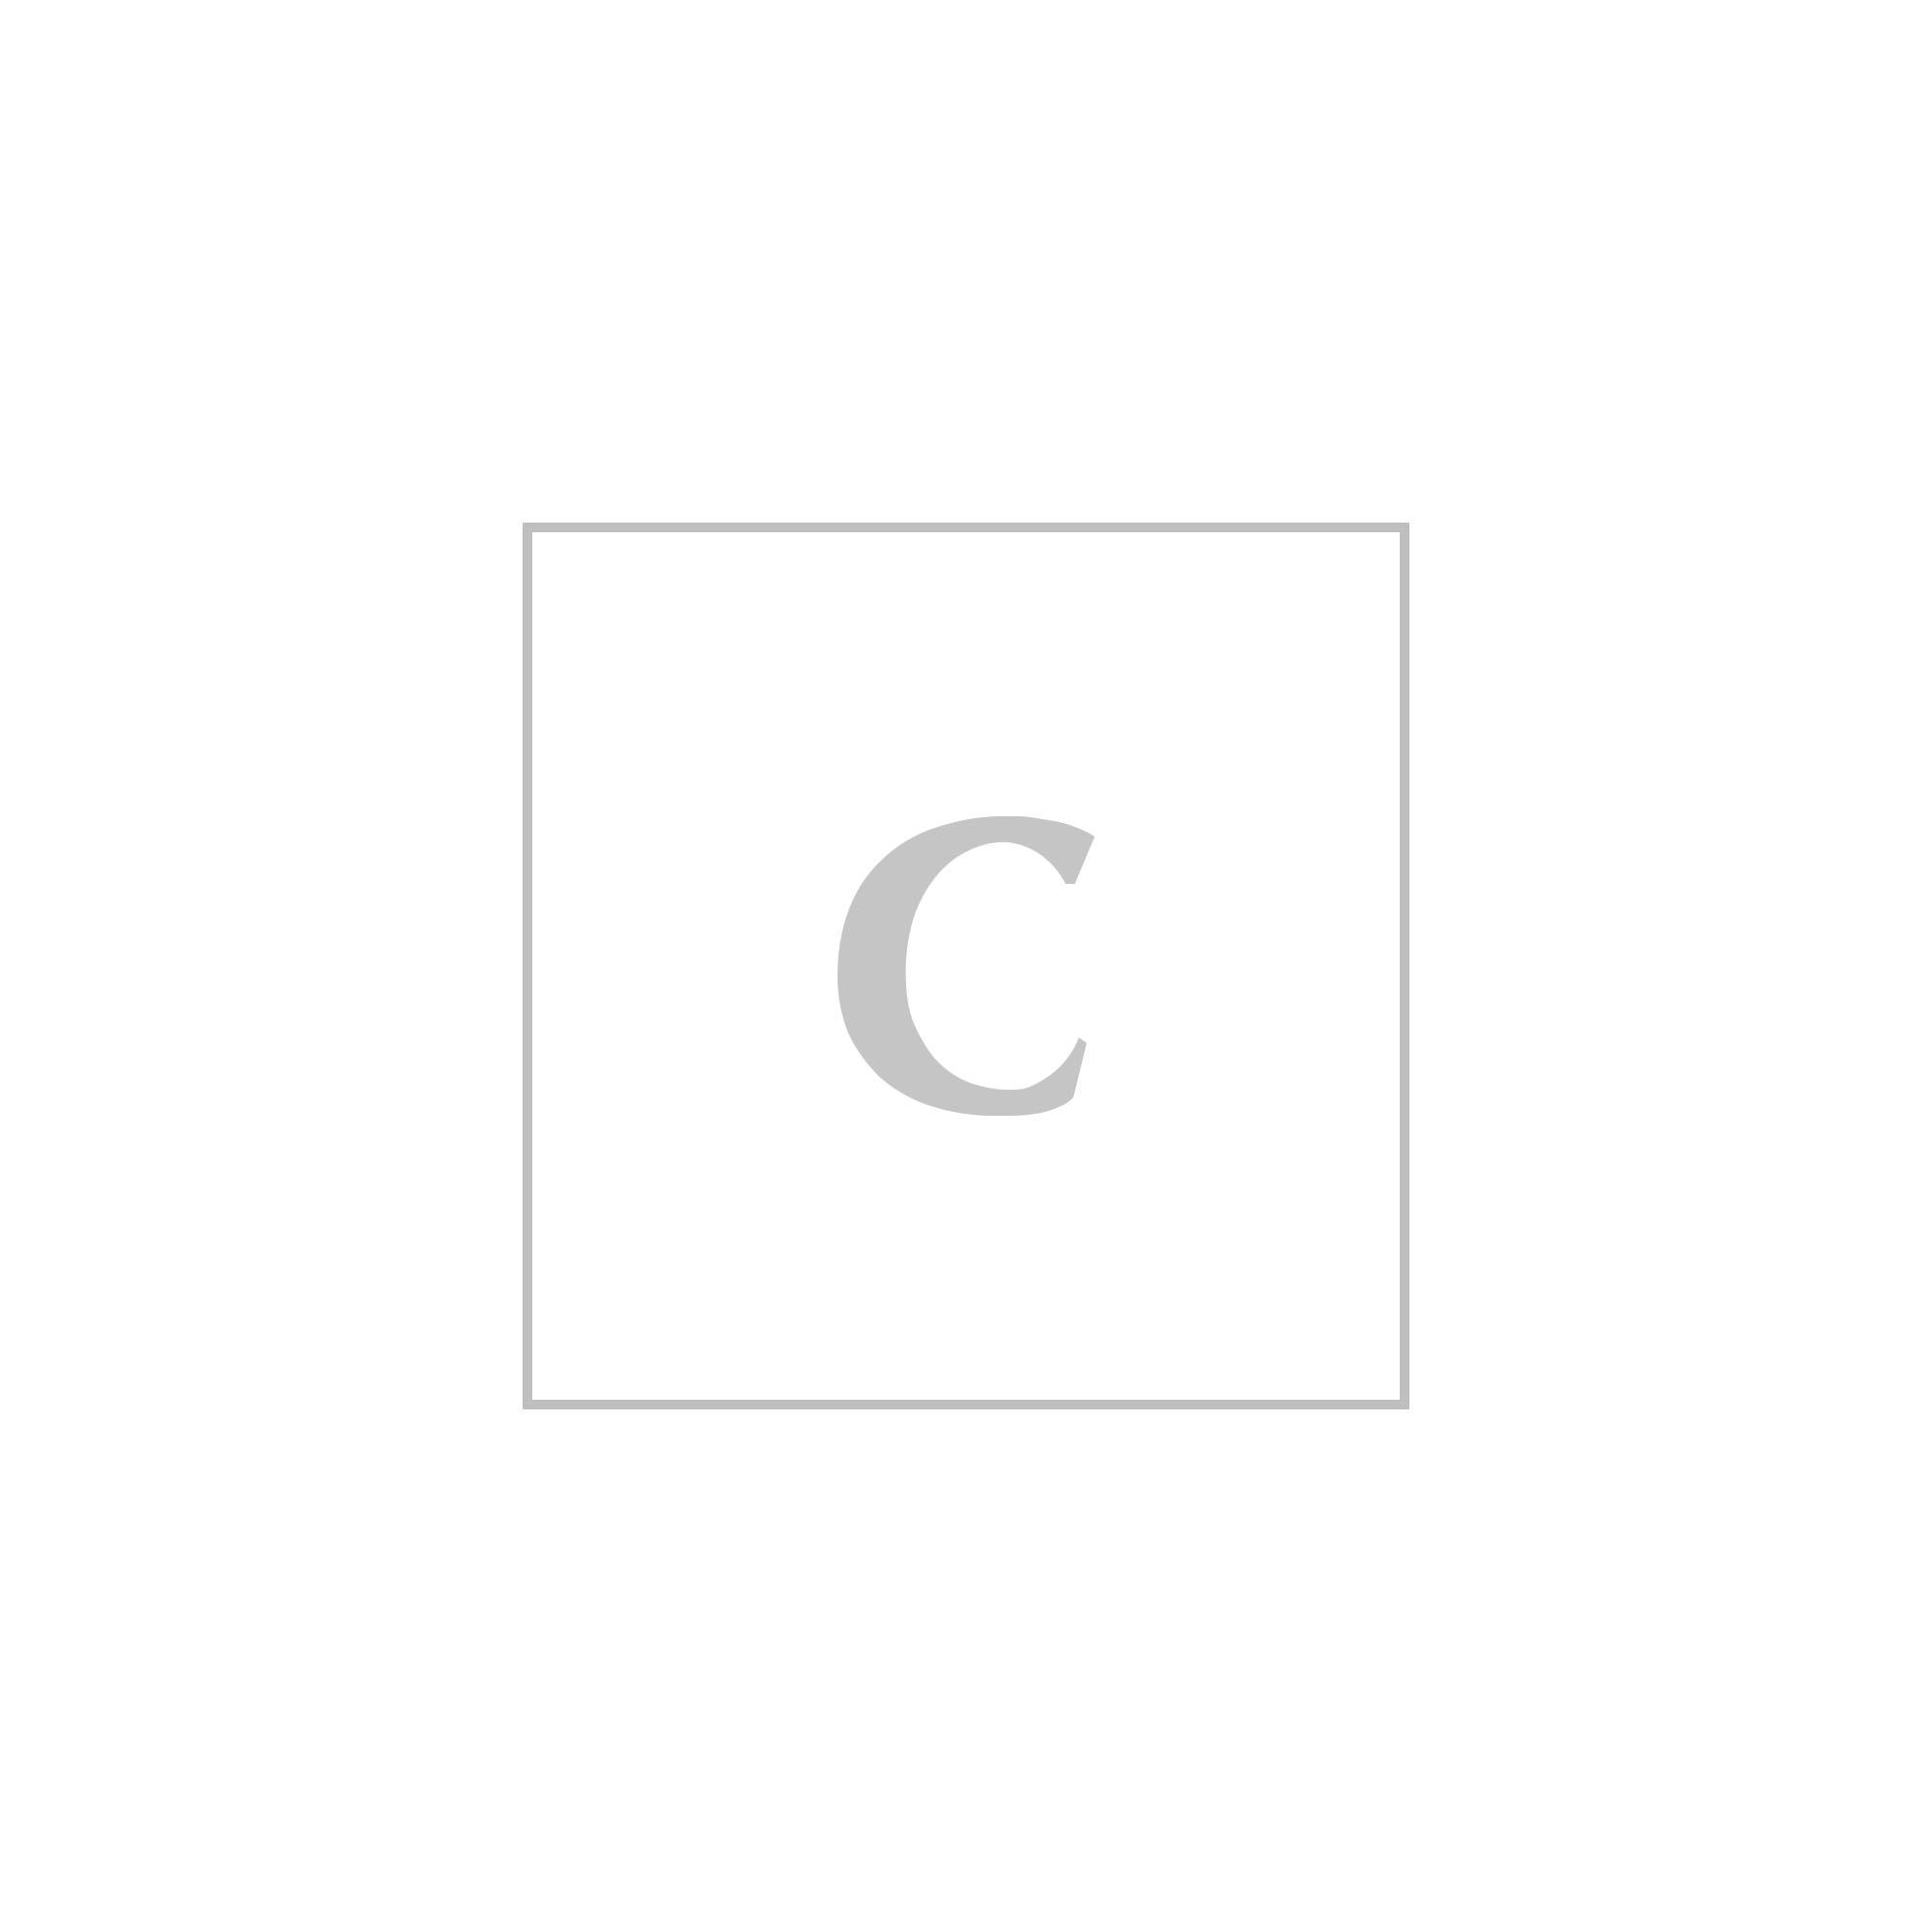 Dolce Gabbana Lace Charmant Pump CD0066.AL198 80005